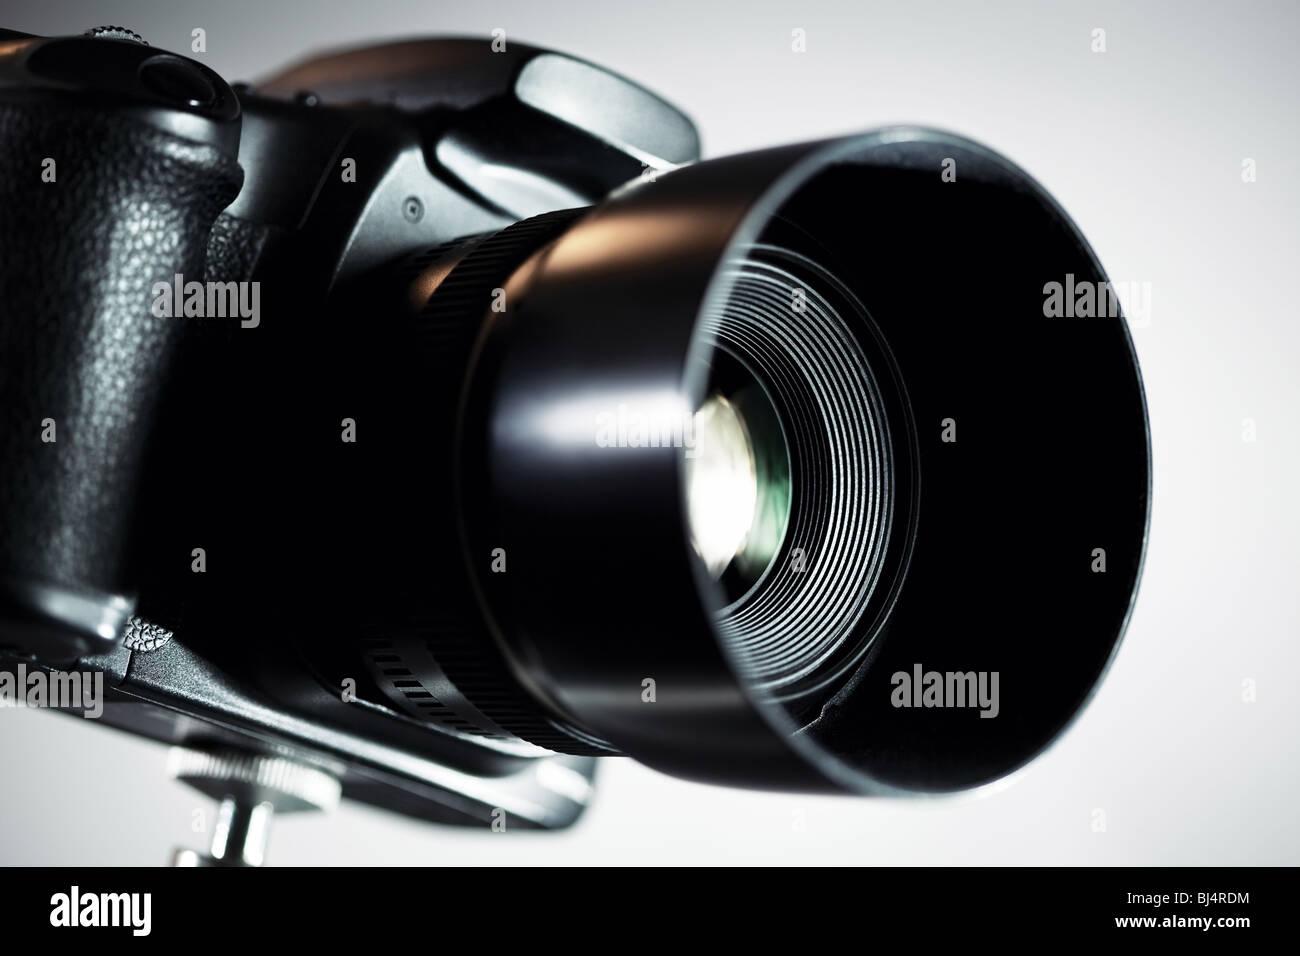 Professional DSLR camera on grey background. - Stock Image